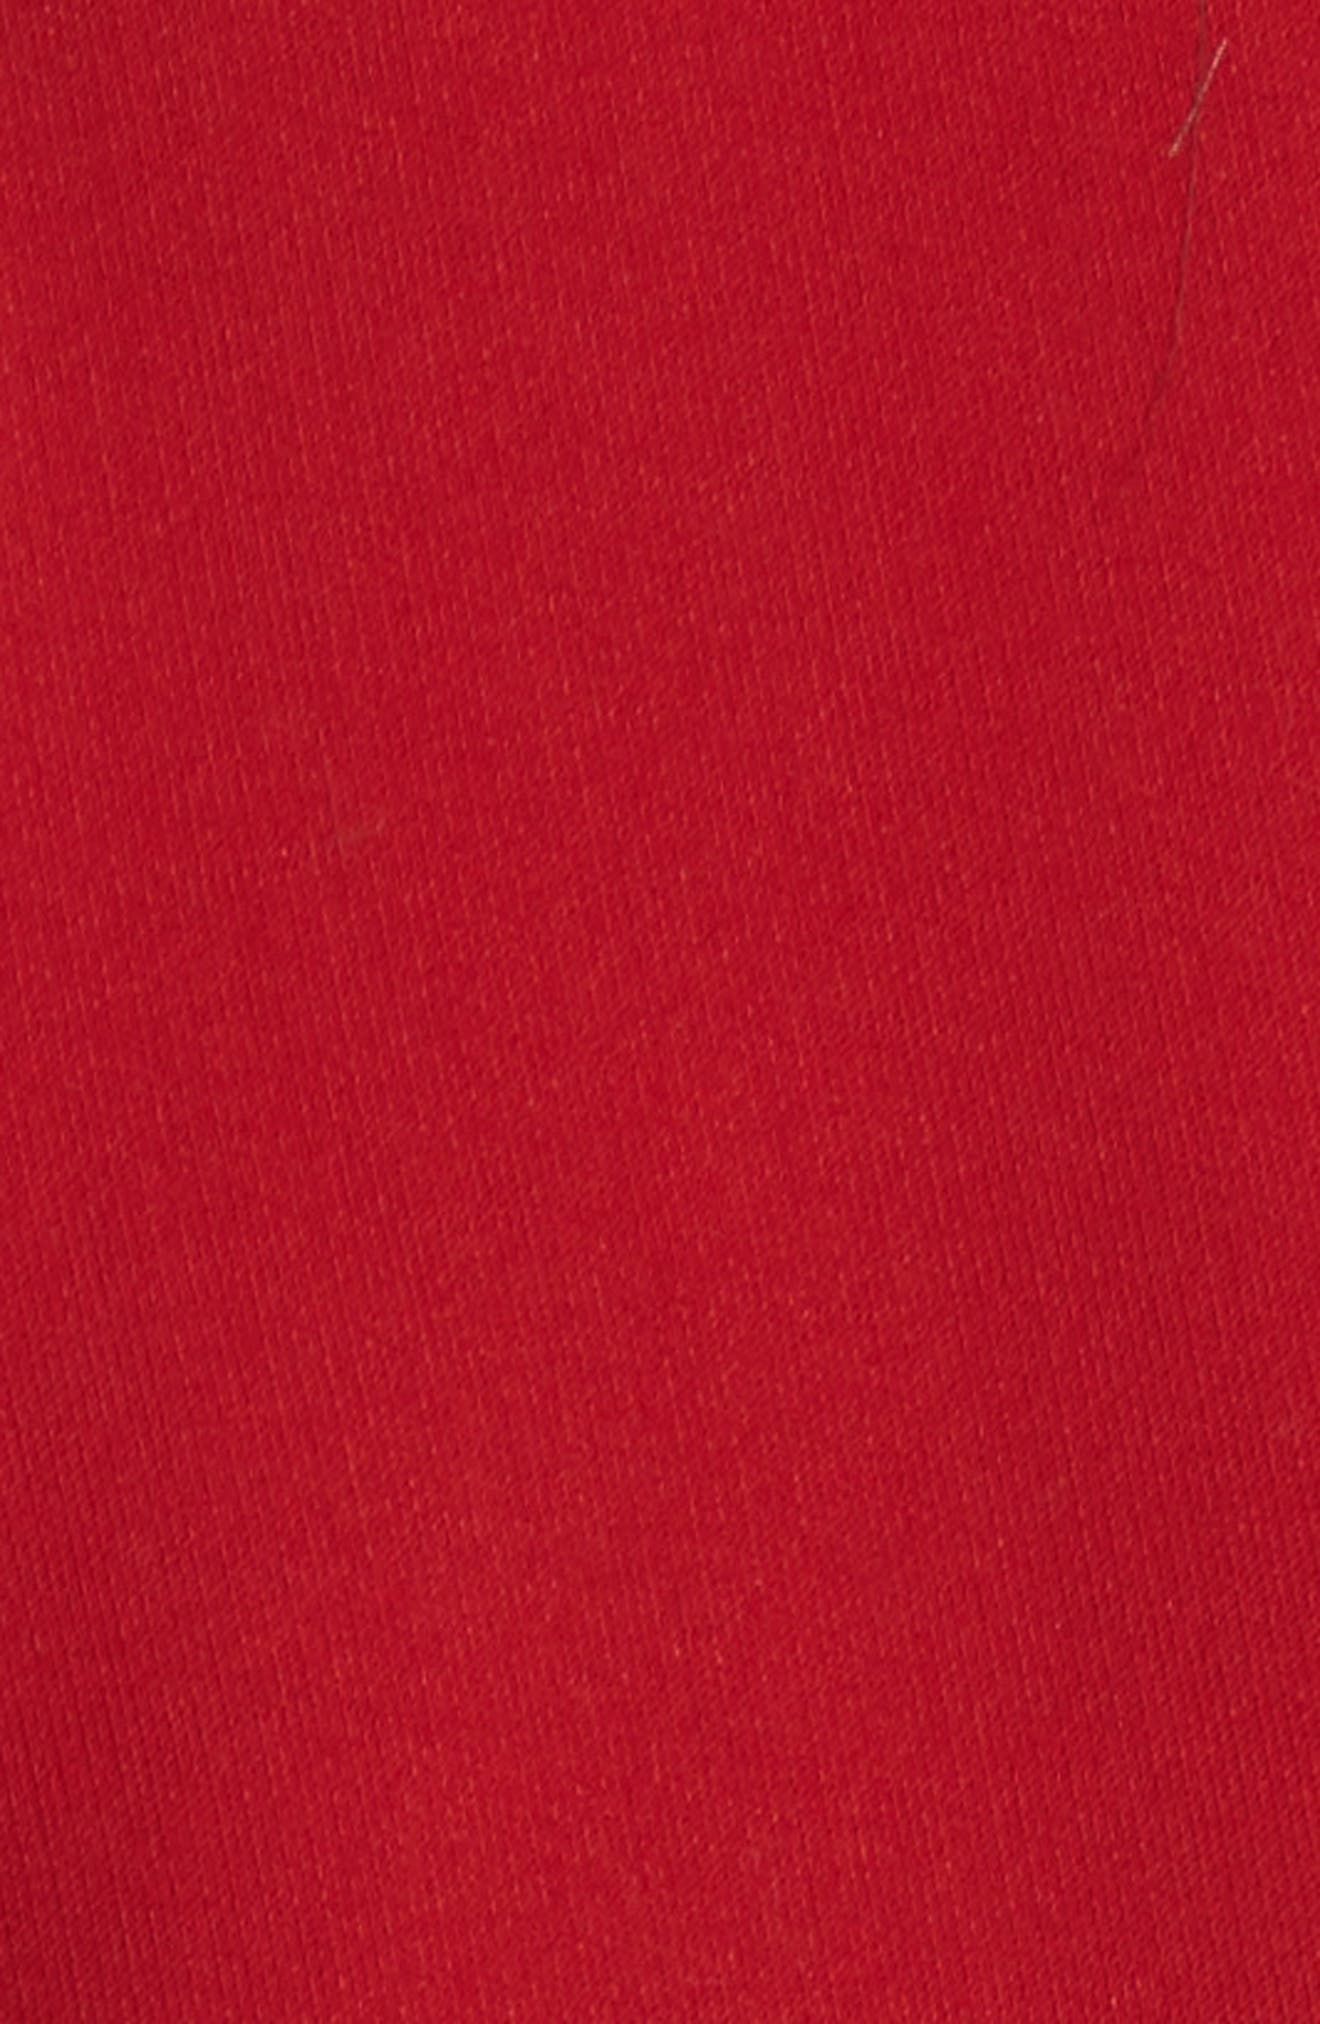 Micah Ruffle Cold Shoulder Dress,                             Alternate thumbnail 5, color,                             641